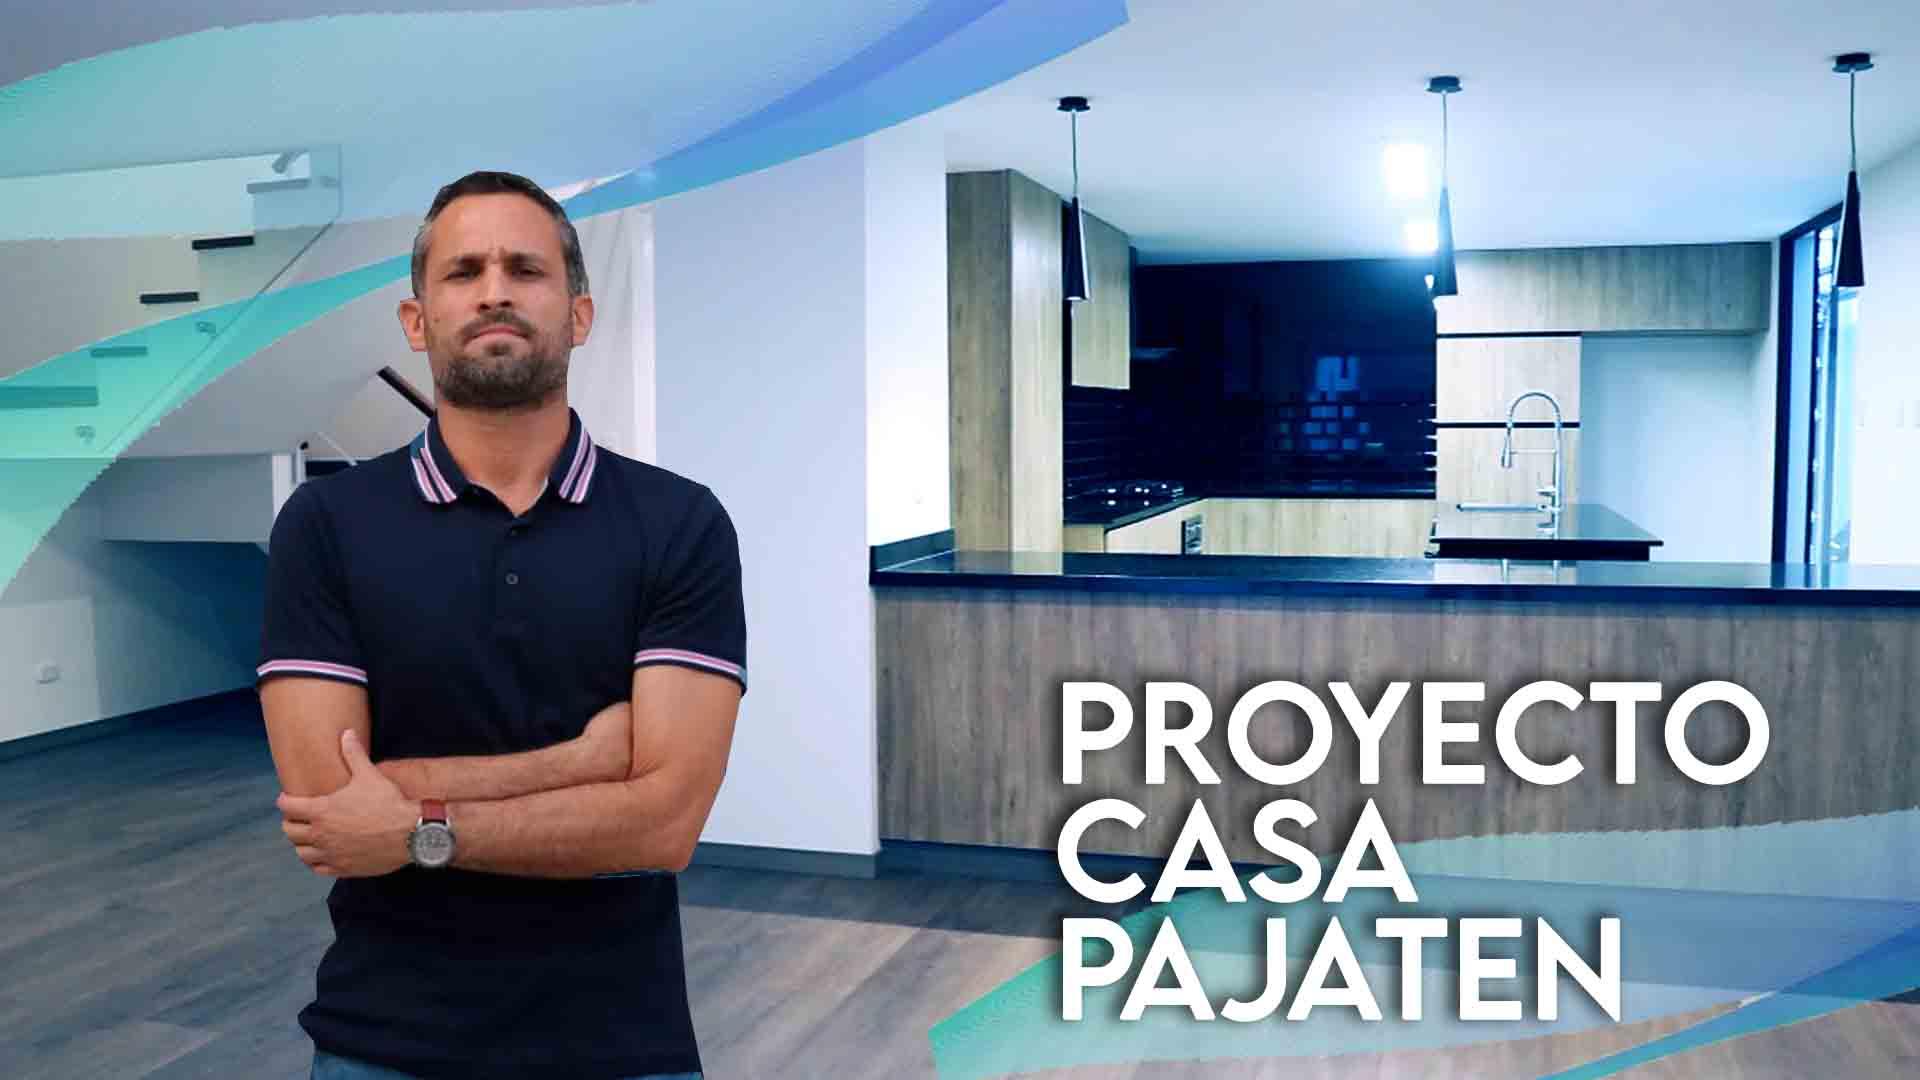 Proyecto Casa Pajaten